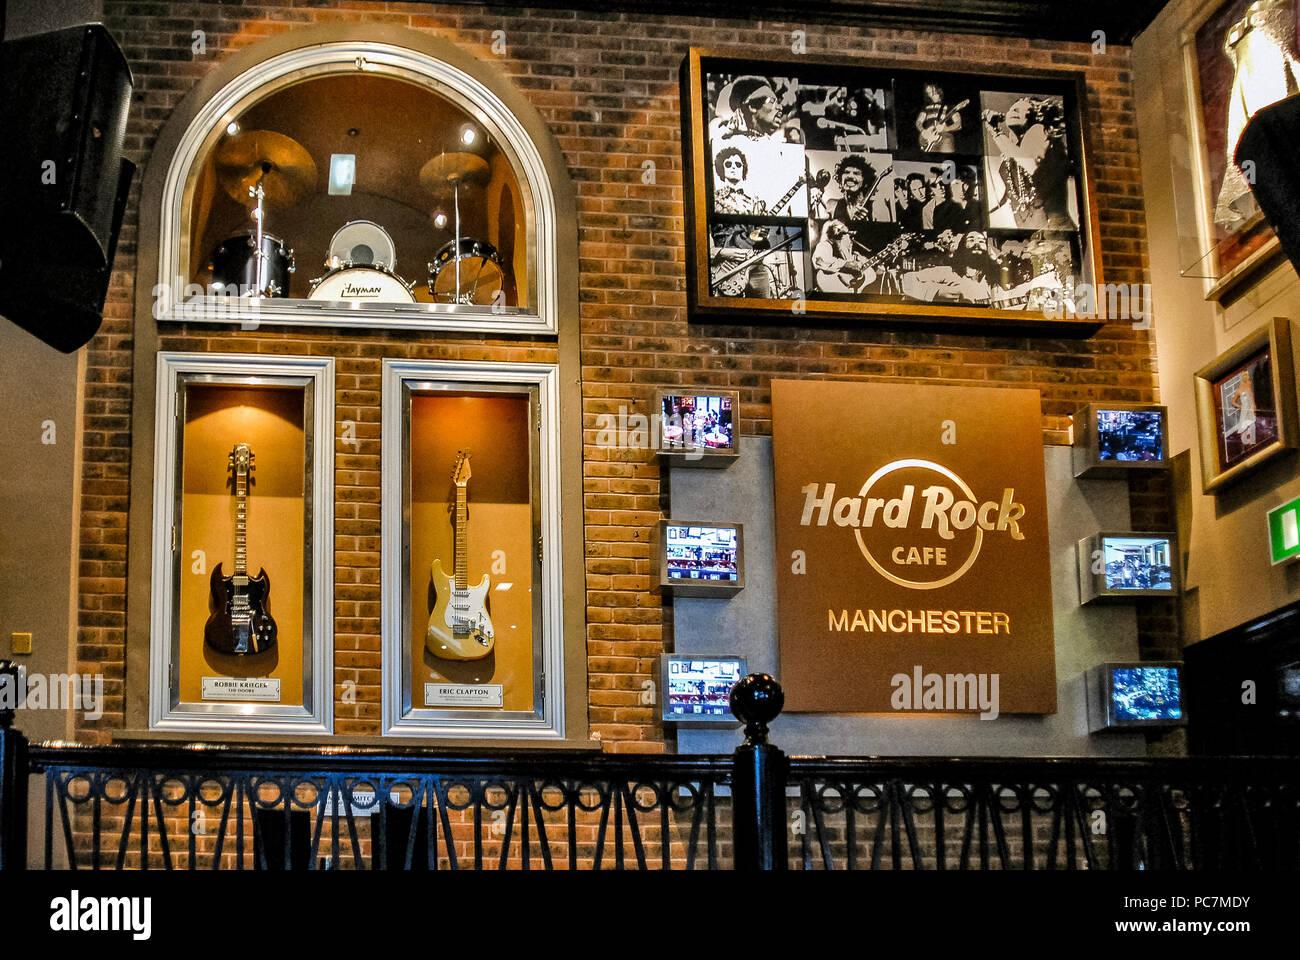 Inglaterra Manchester, Hard Rock Cafe, Eric Clapton Guitar Fotografía de stock - Alamy